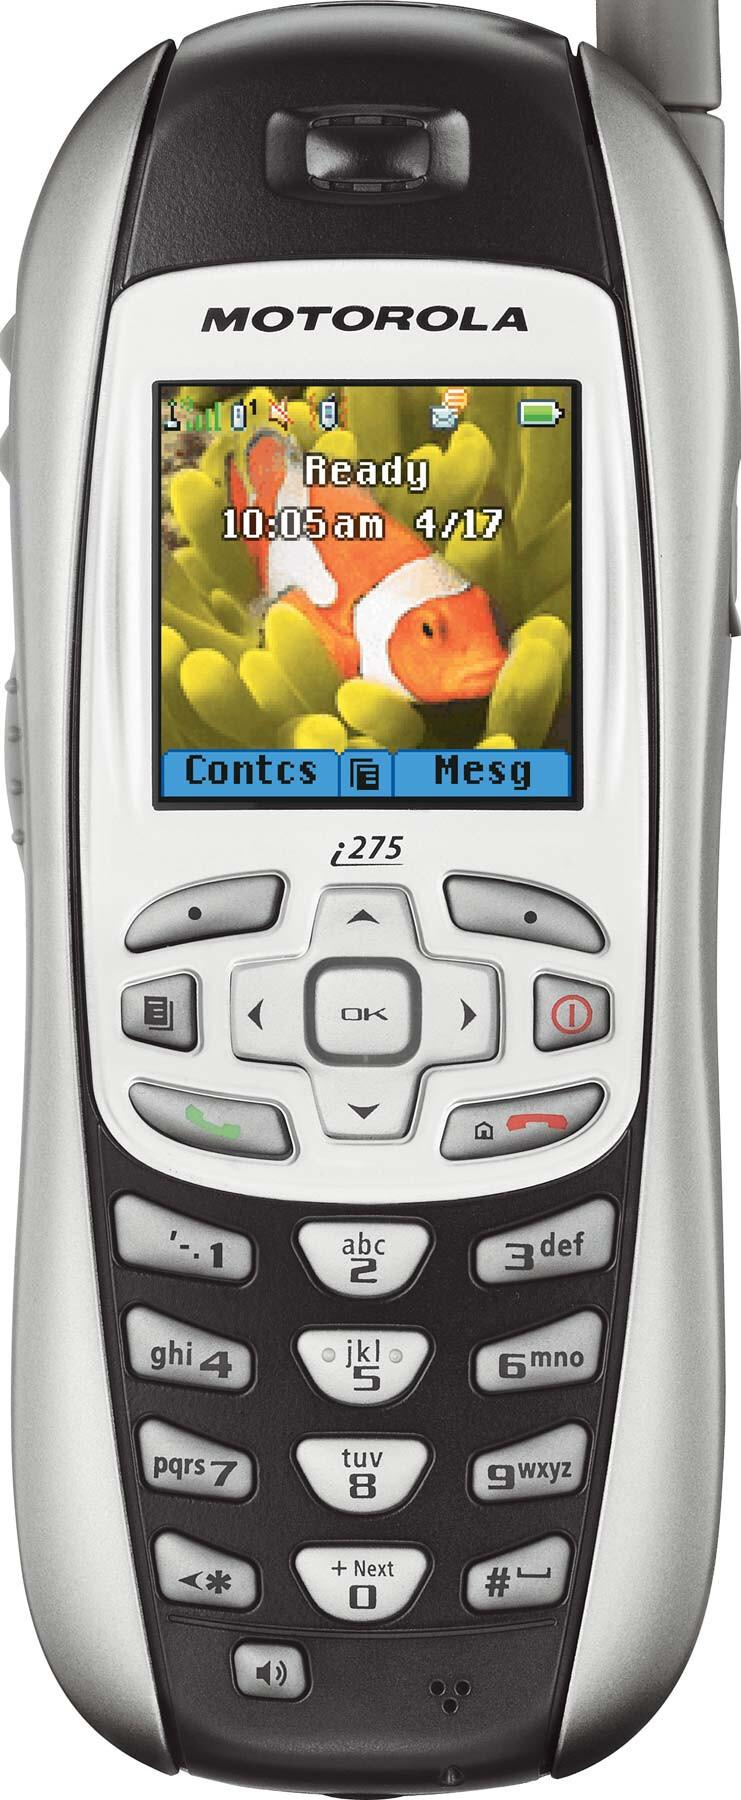 Motorola i275-A Drivers Windows